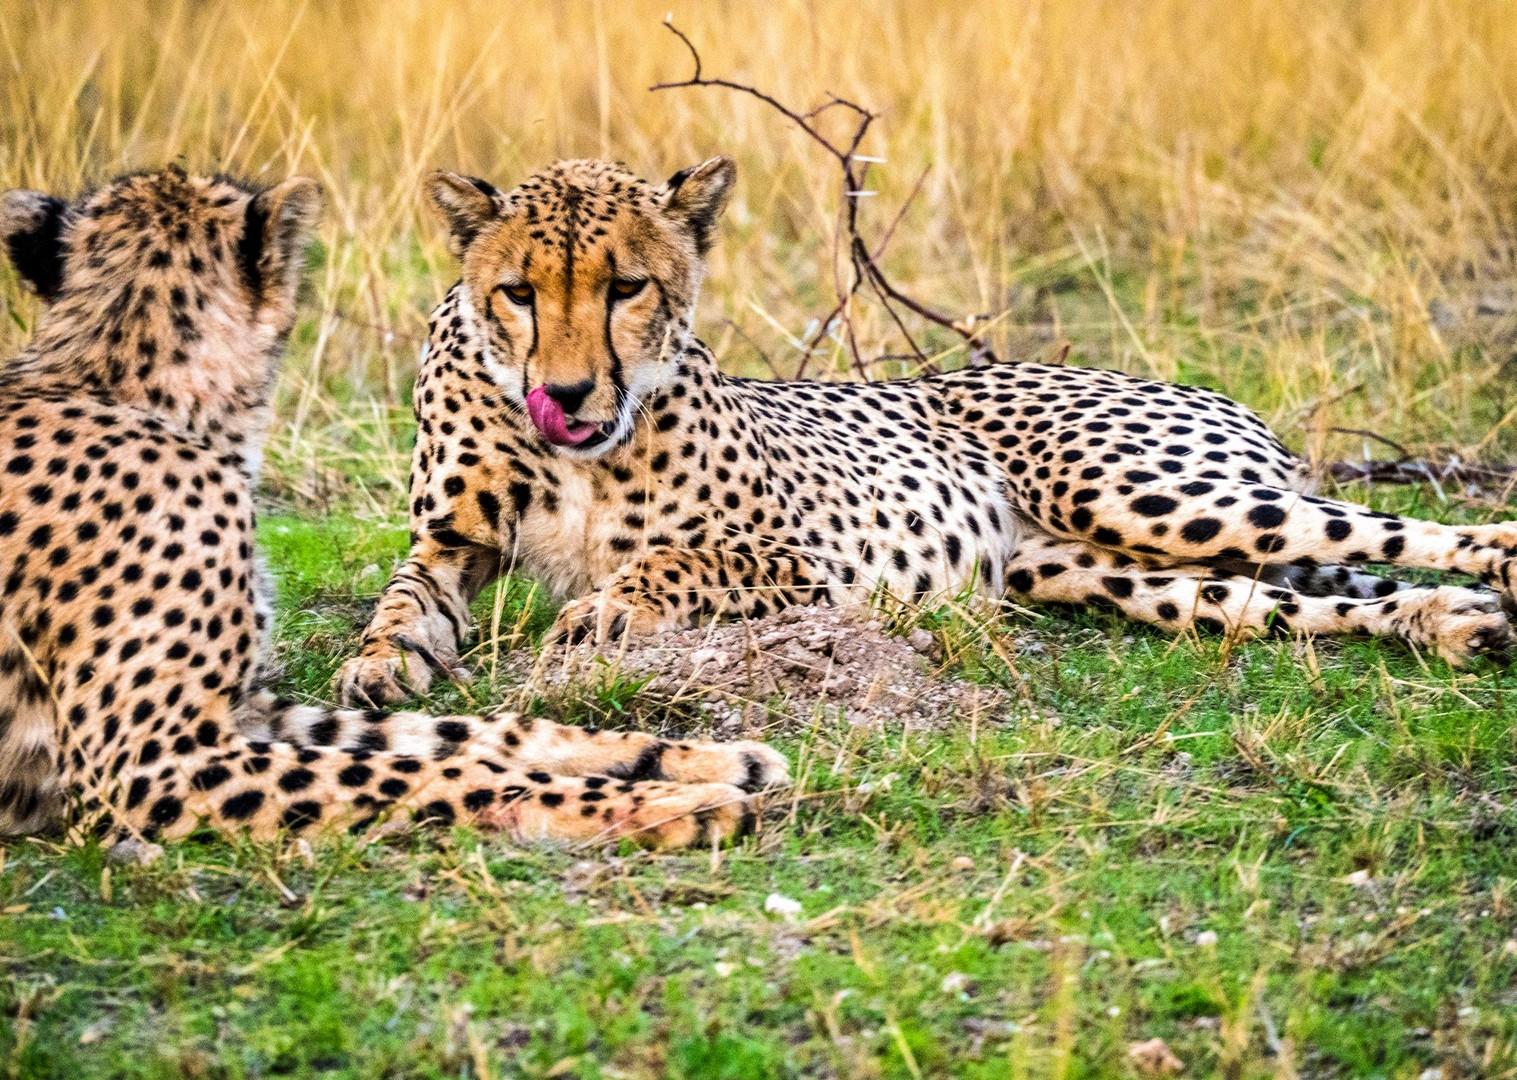 cheetah-mountain-biking-mtb-holiday-south-africa-animals.jpg - NEW! South Africa and Botswana - Mountain Biking